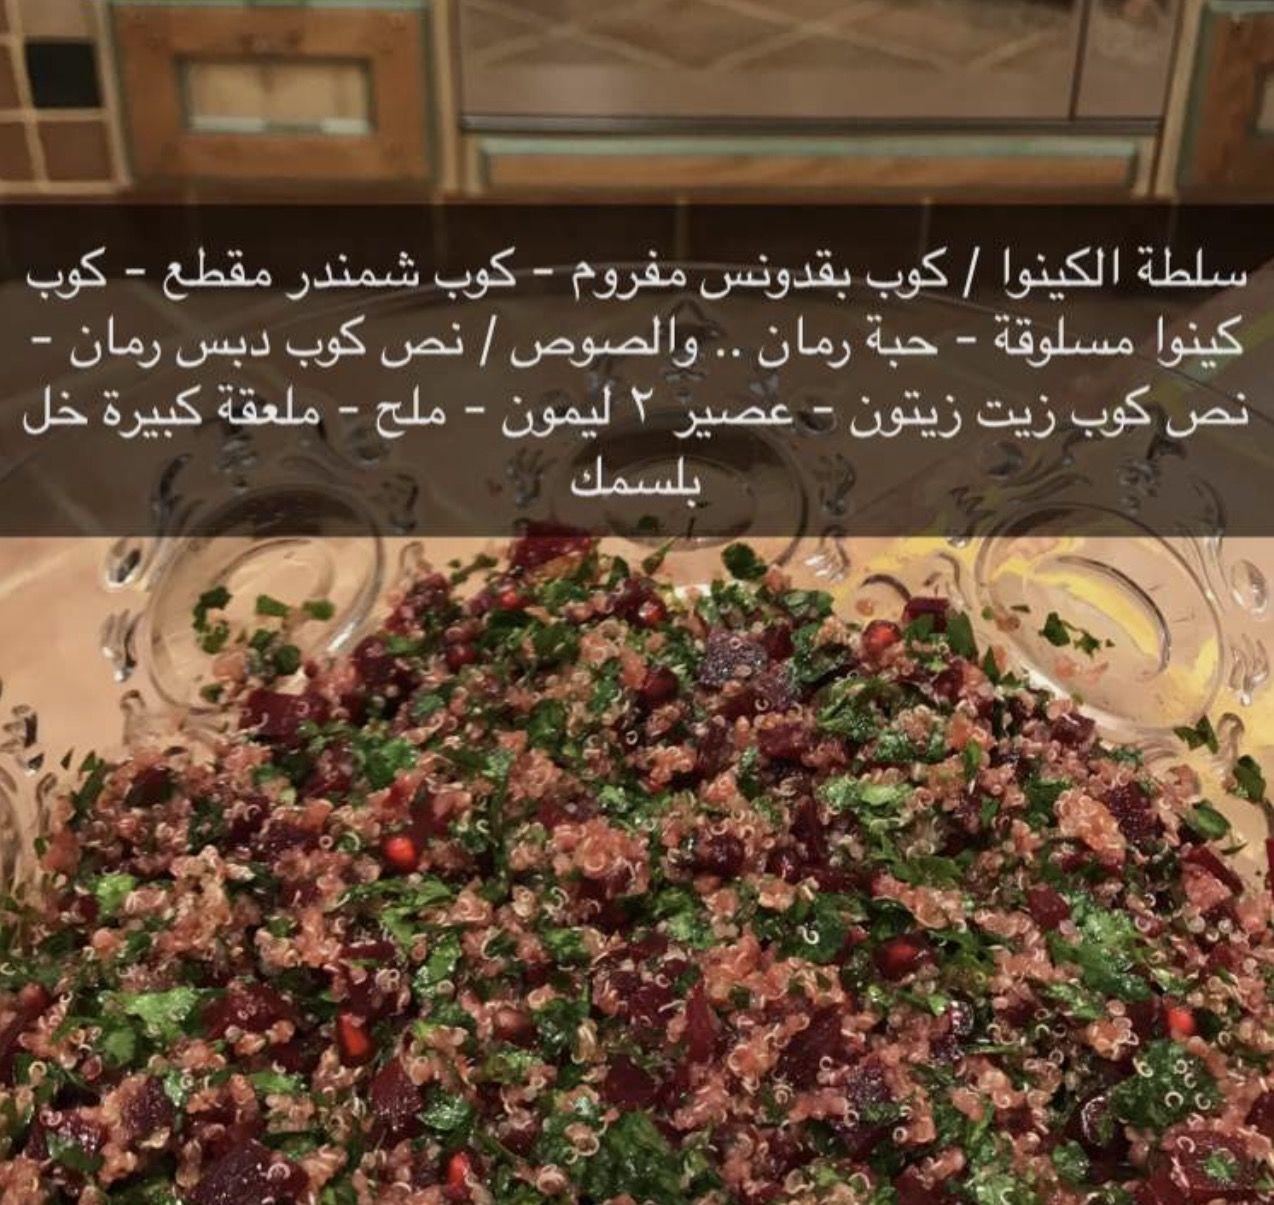 سدطة الكينوا لذيذه Cookout Food Food Receipes Snap Food